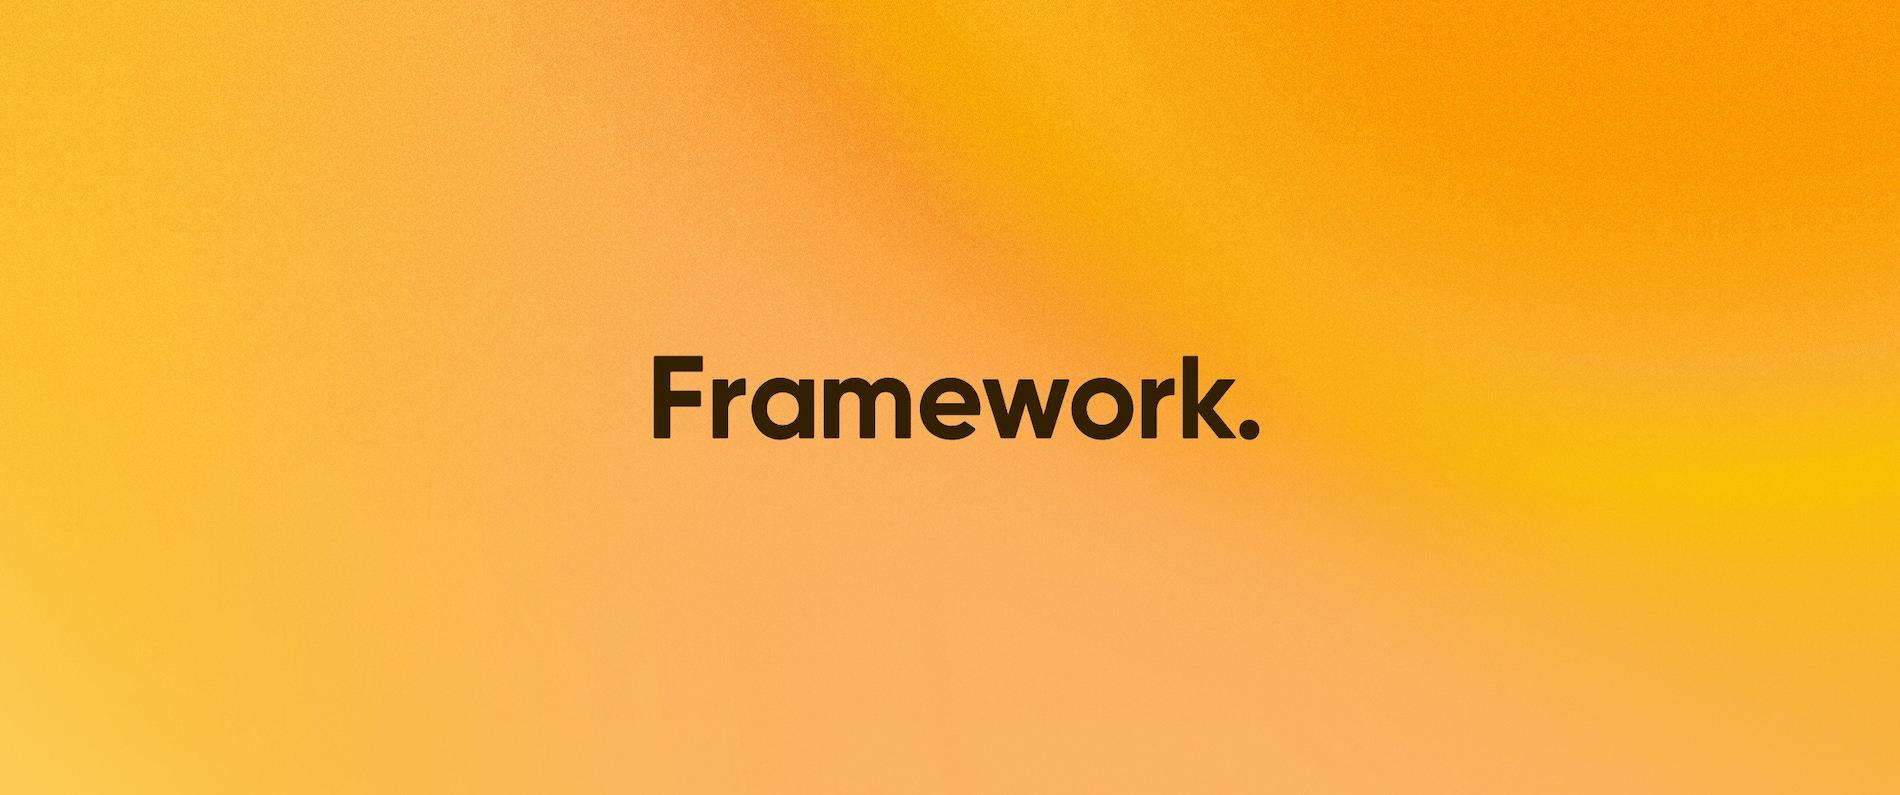 The Framework logo on an orange background